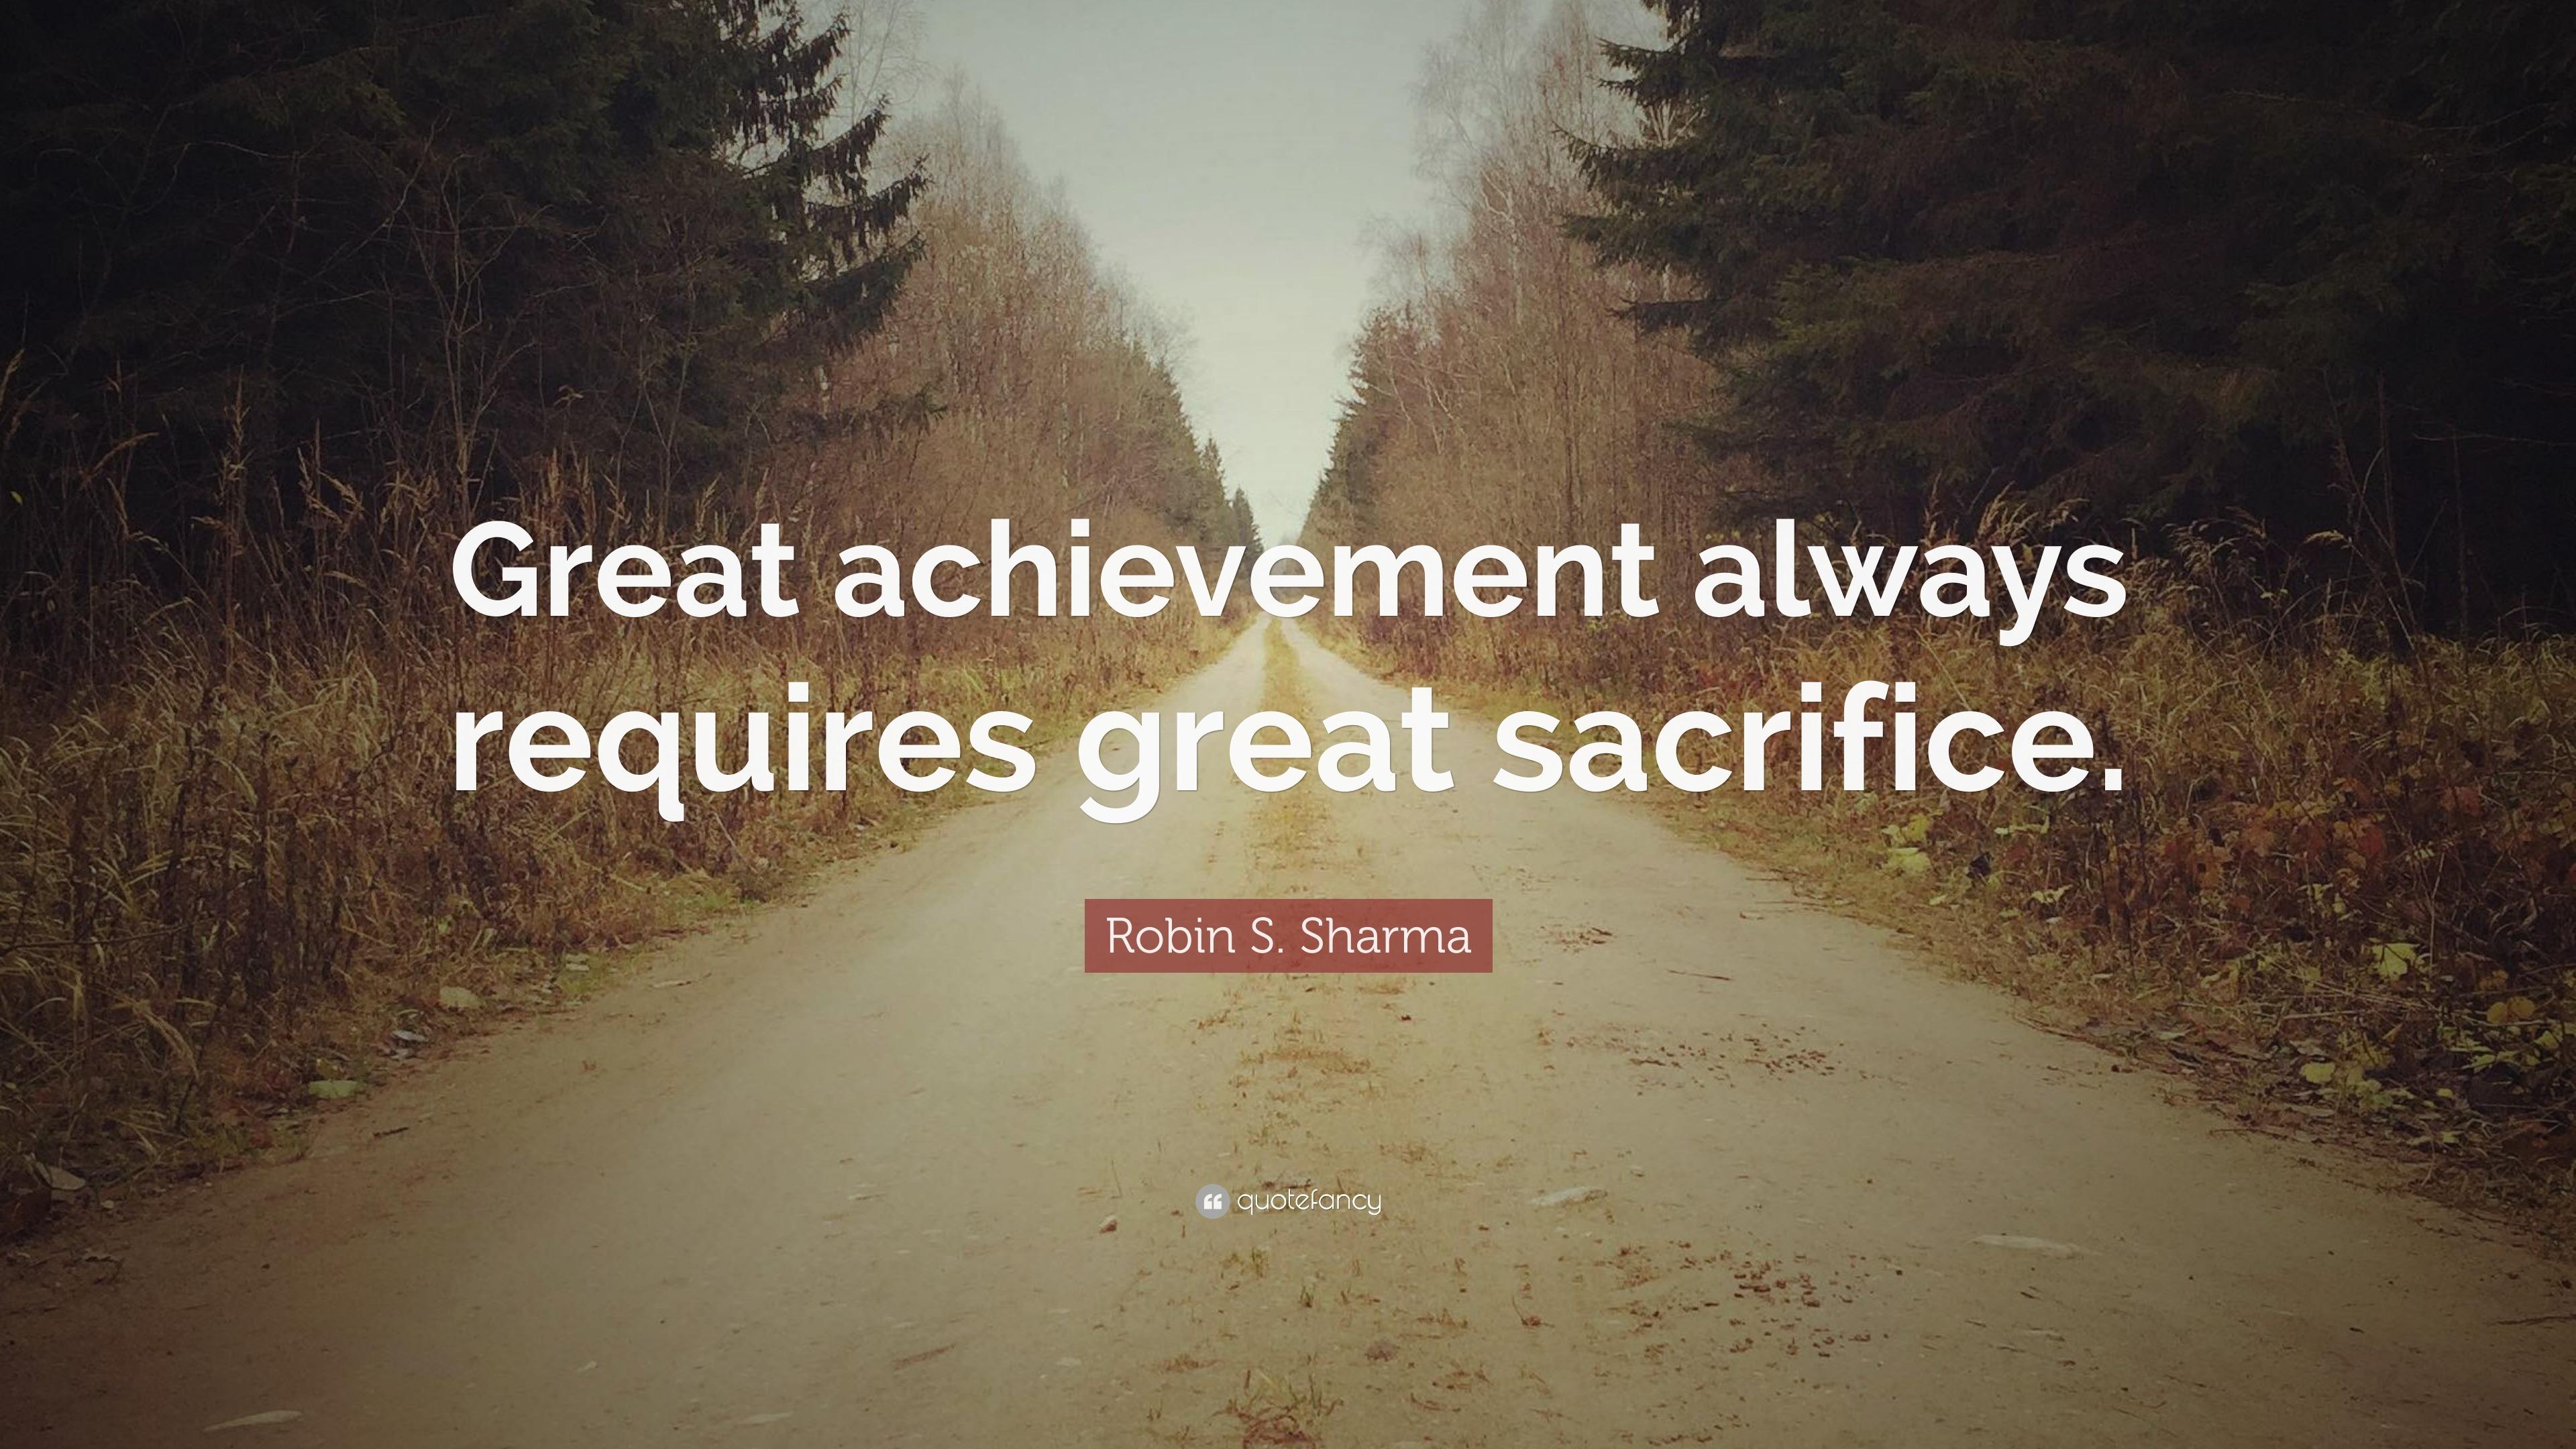 Image of: Teaching Children Achievement Quotes great Achievement Always Requires Great Sacrifice Robin S Quotefancy Achievement Quotes 40 Wallpapers Quotefancy